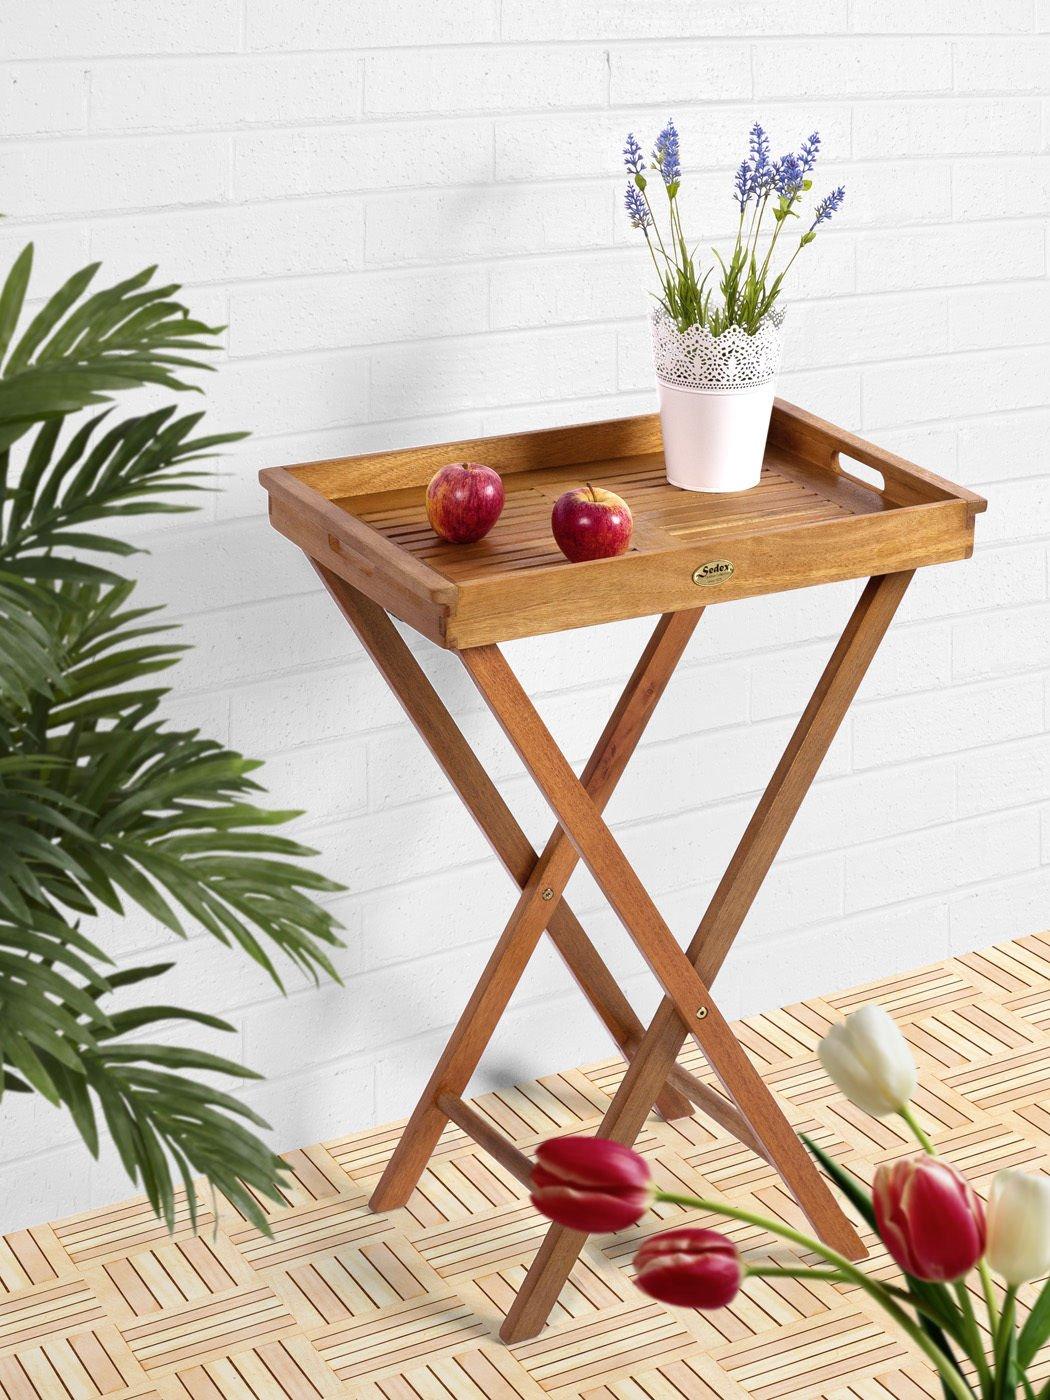 Balkon Klapptisch BISTRO FSC Eukalyptus, natur geölt, abnehmbares Tablett – Modell DELHI jetzt bestellen